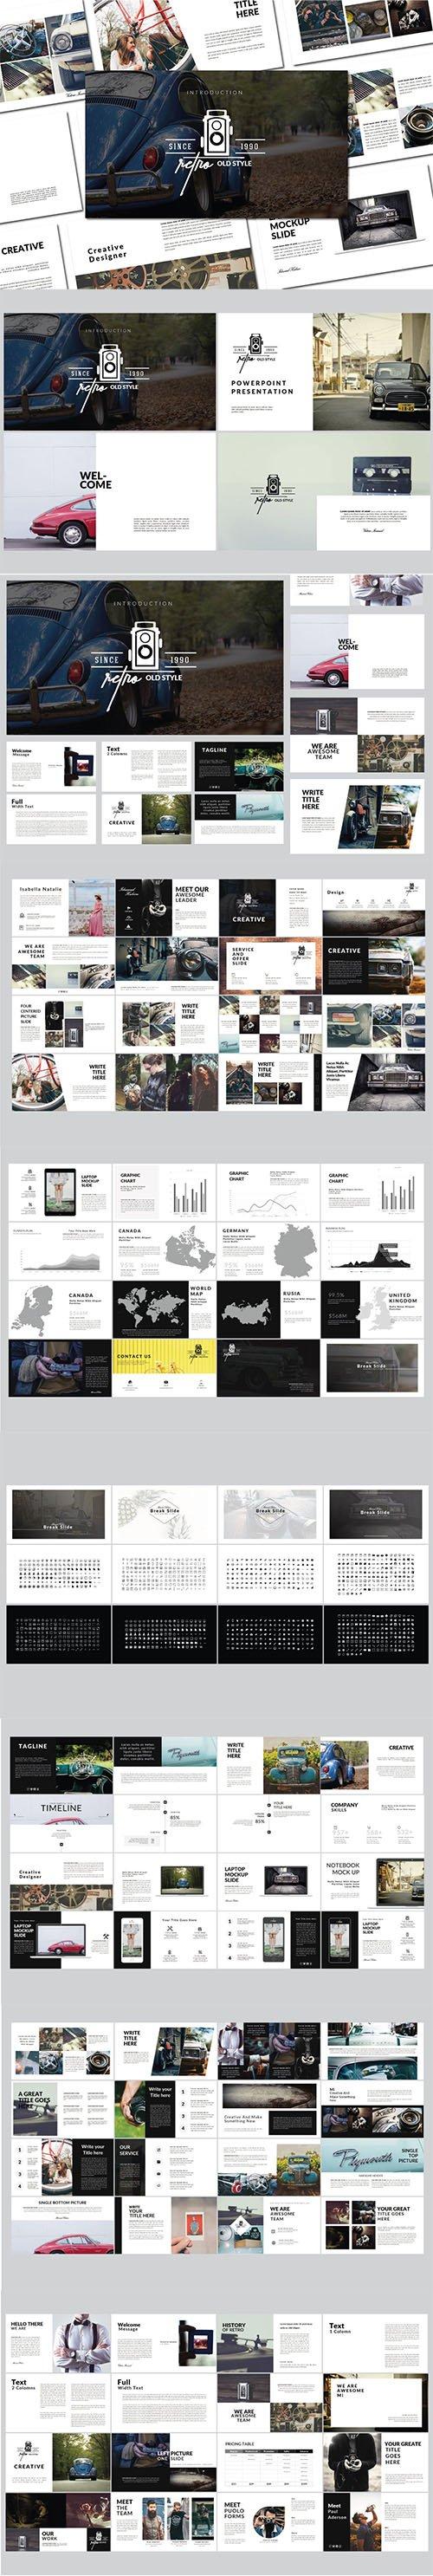 Retro | Powerpoint Template